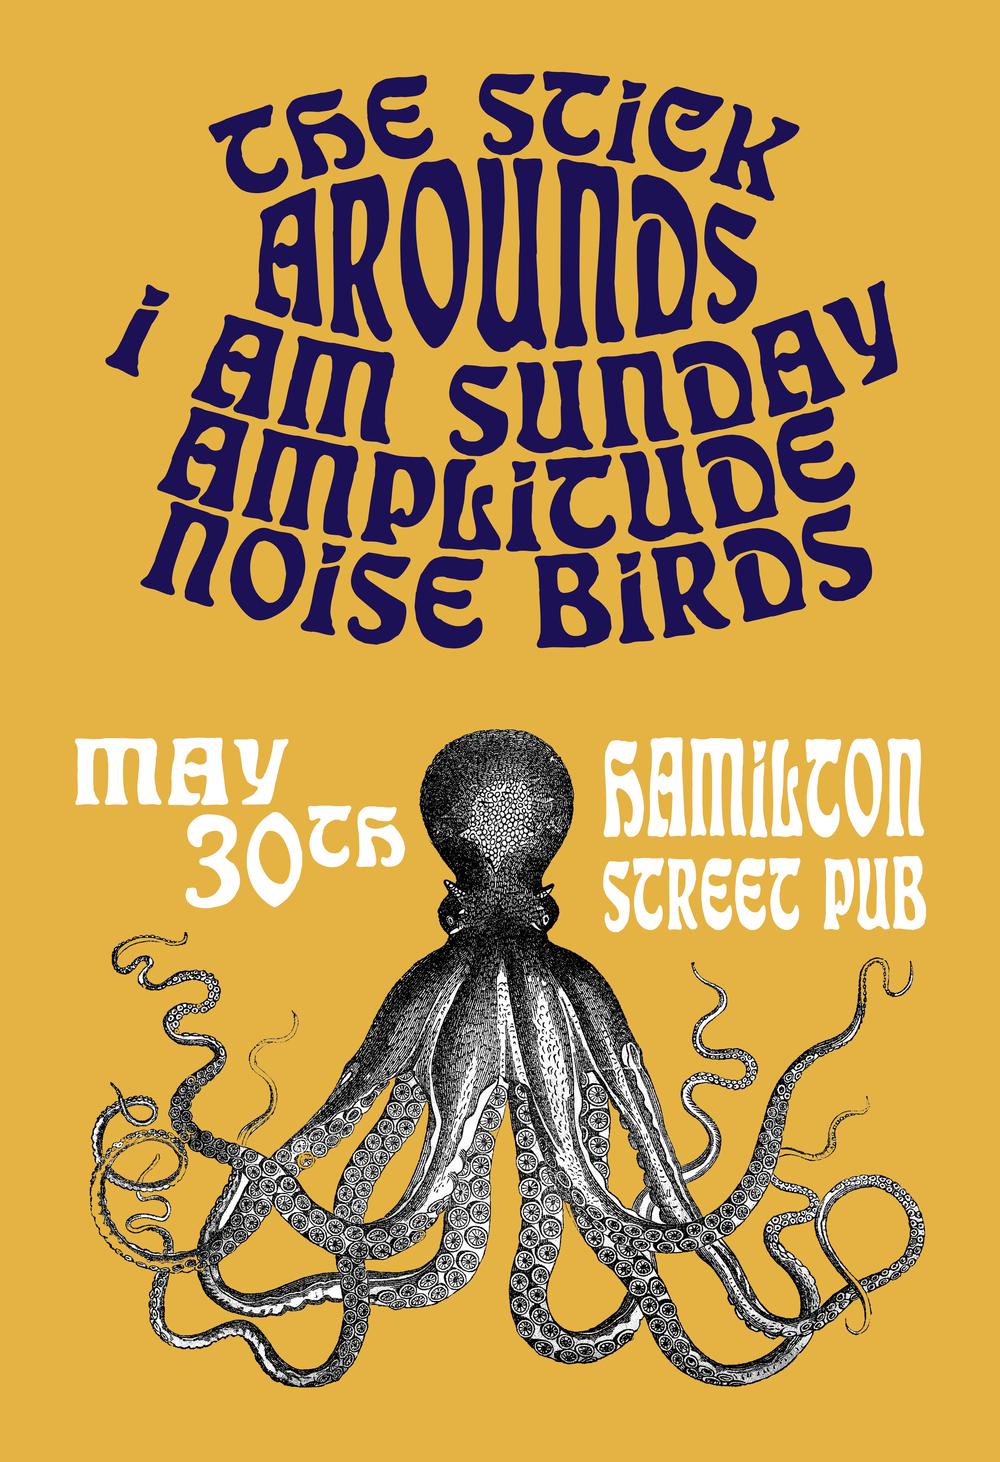 Stick Arounds Hamilton Street May 30 Poster.jpg